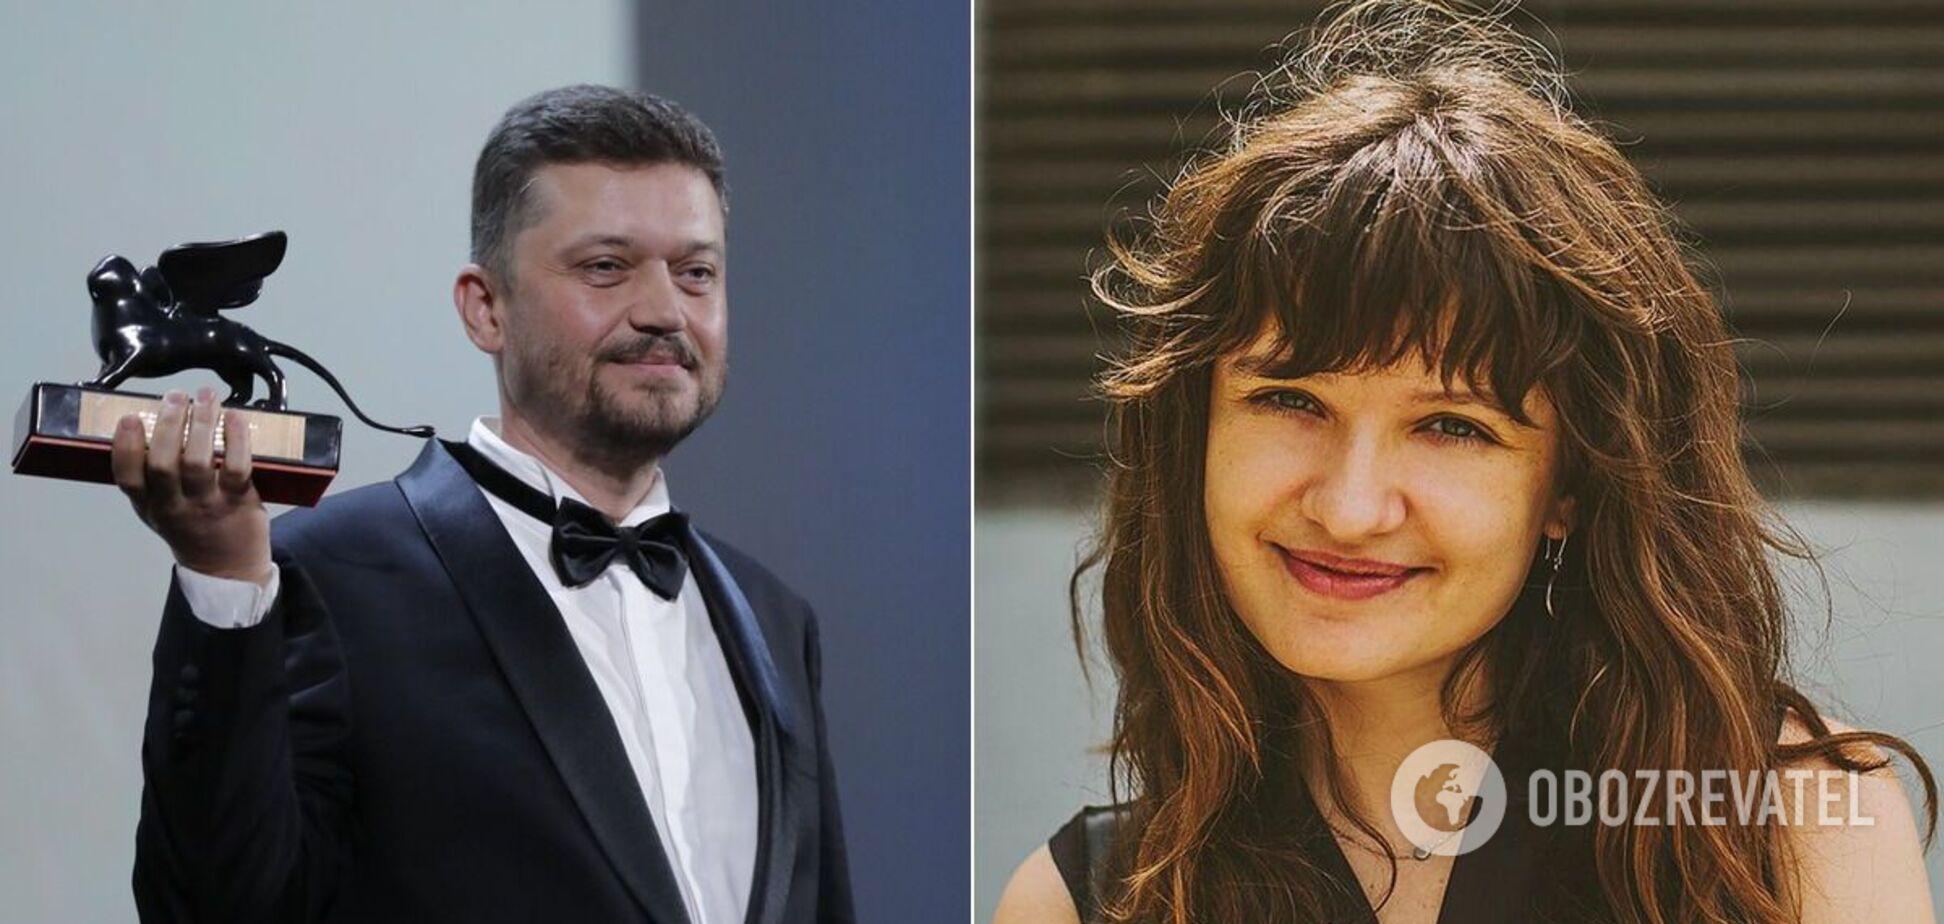 С сайта Офиса президента убрали указ о награждении Васяновича и Цилык: они отказались от признания